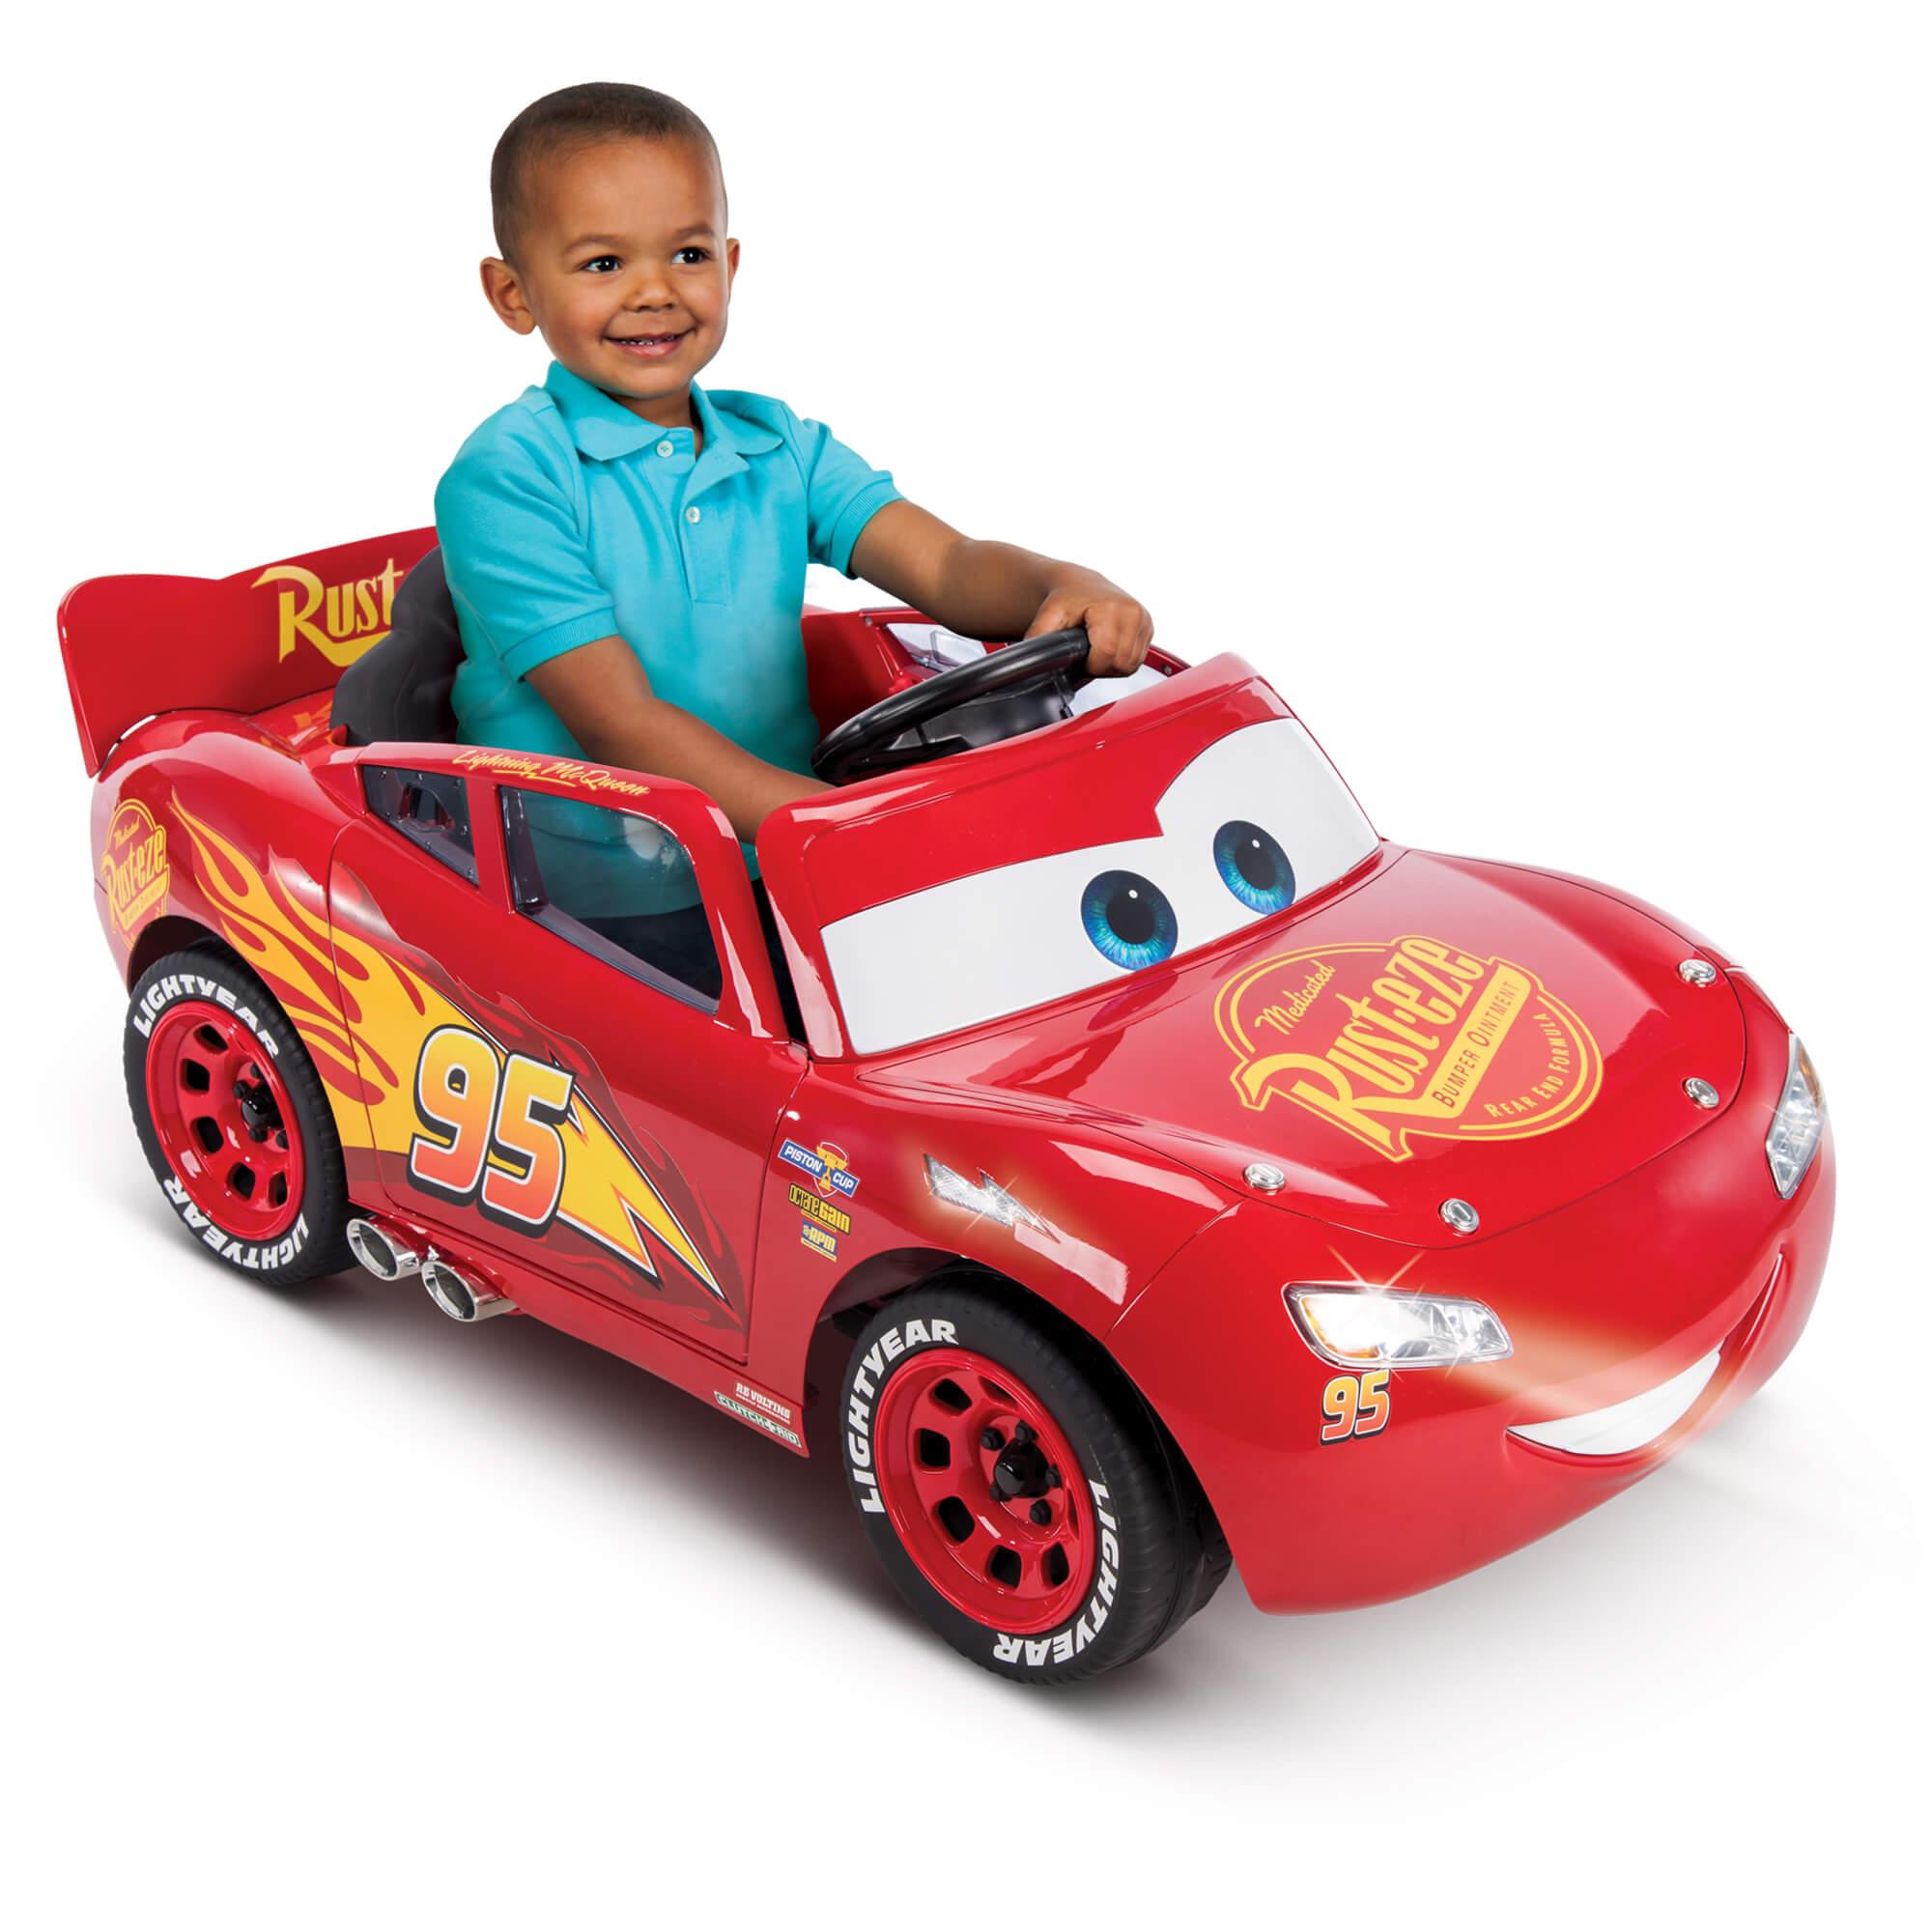 disney pixar cars 3 lightning mcqueen 6v battery powered ride on for 79 shipped from walmart. Black Bedroom Furniture Sets. Home Design Ideas